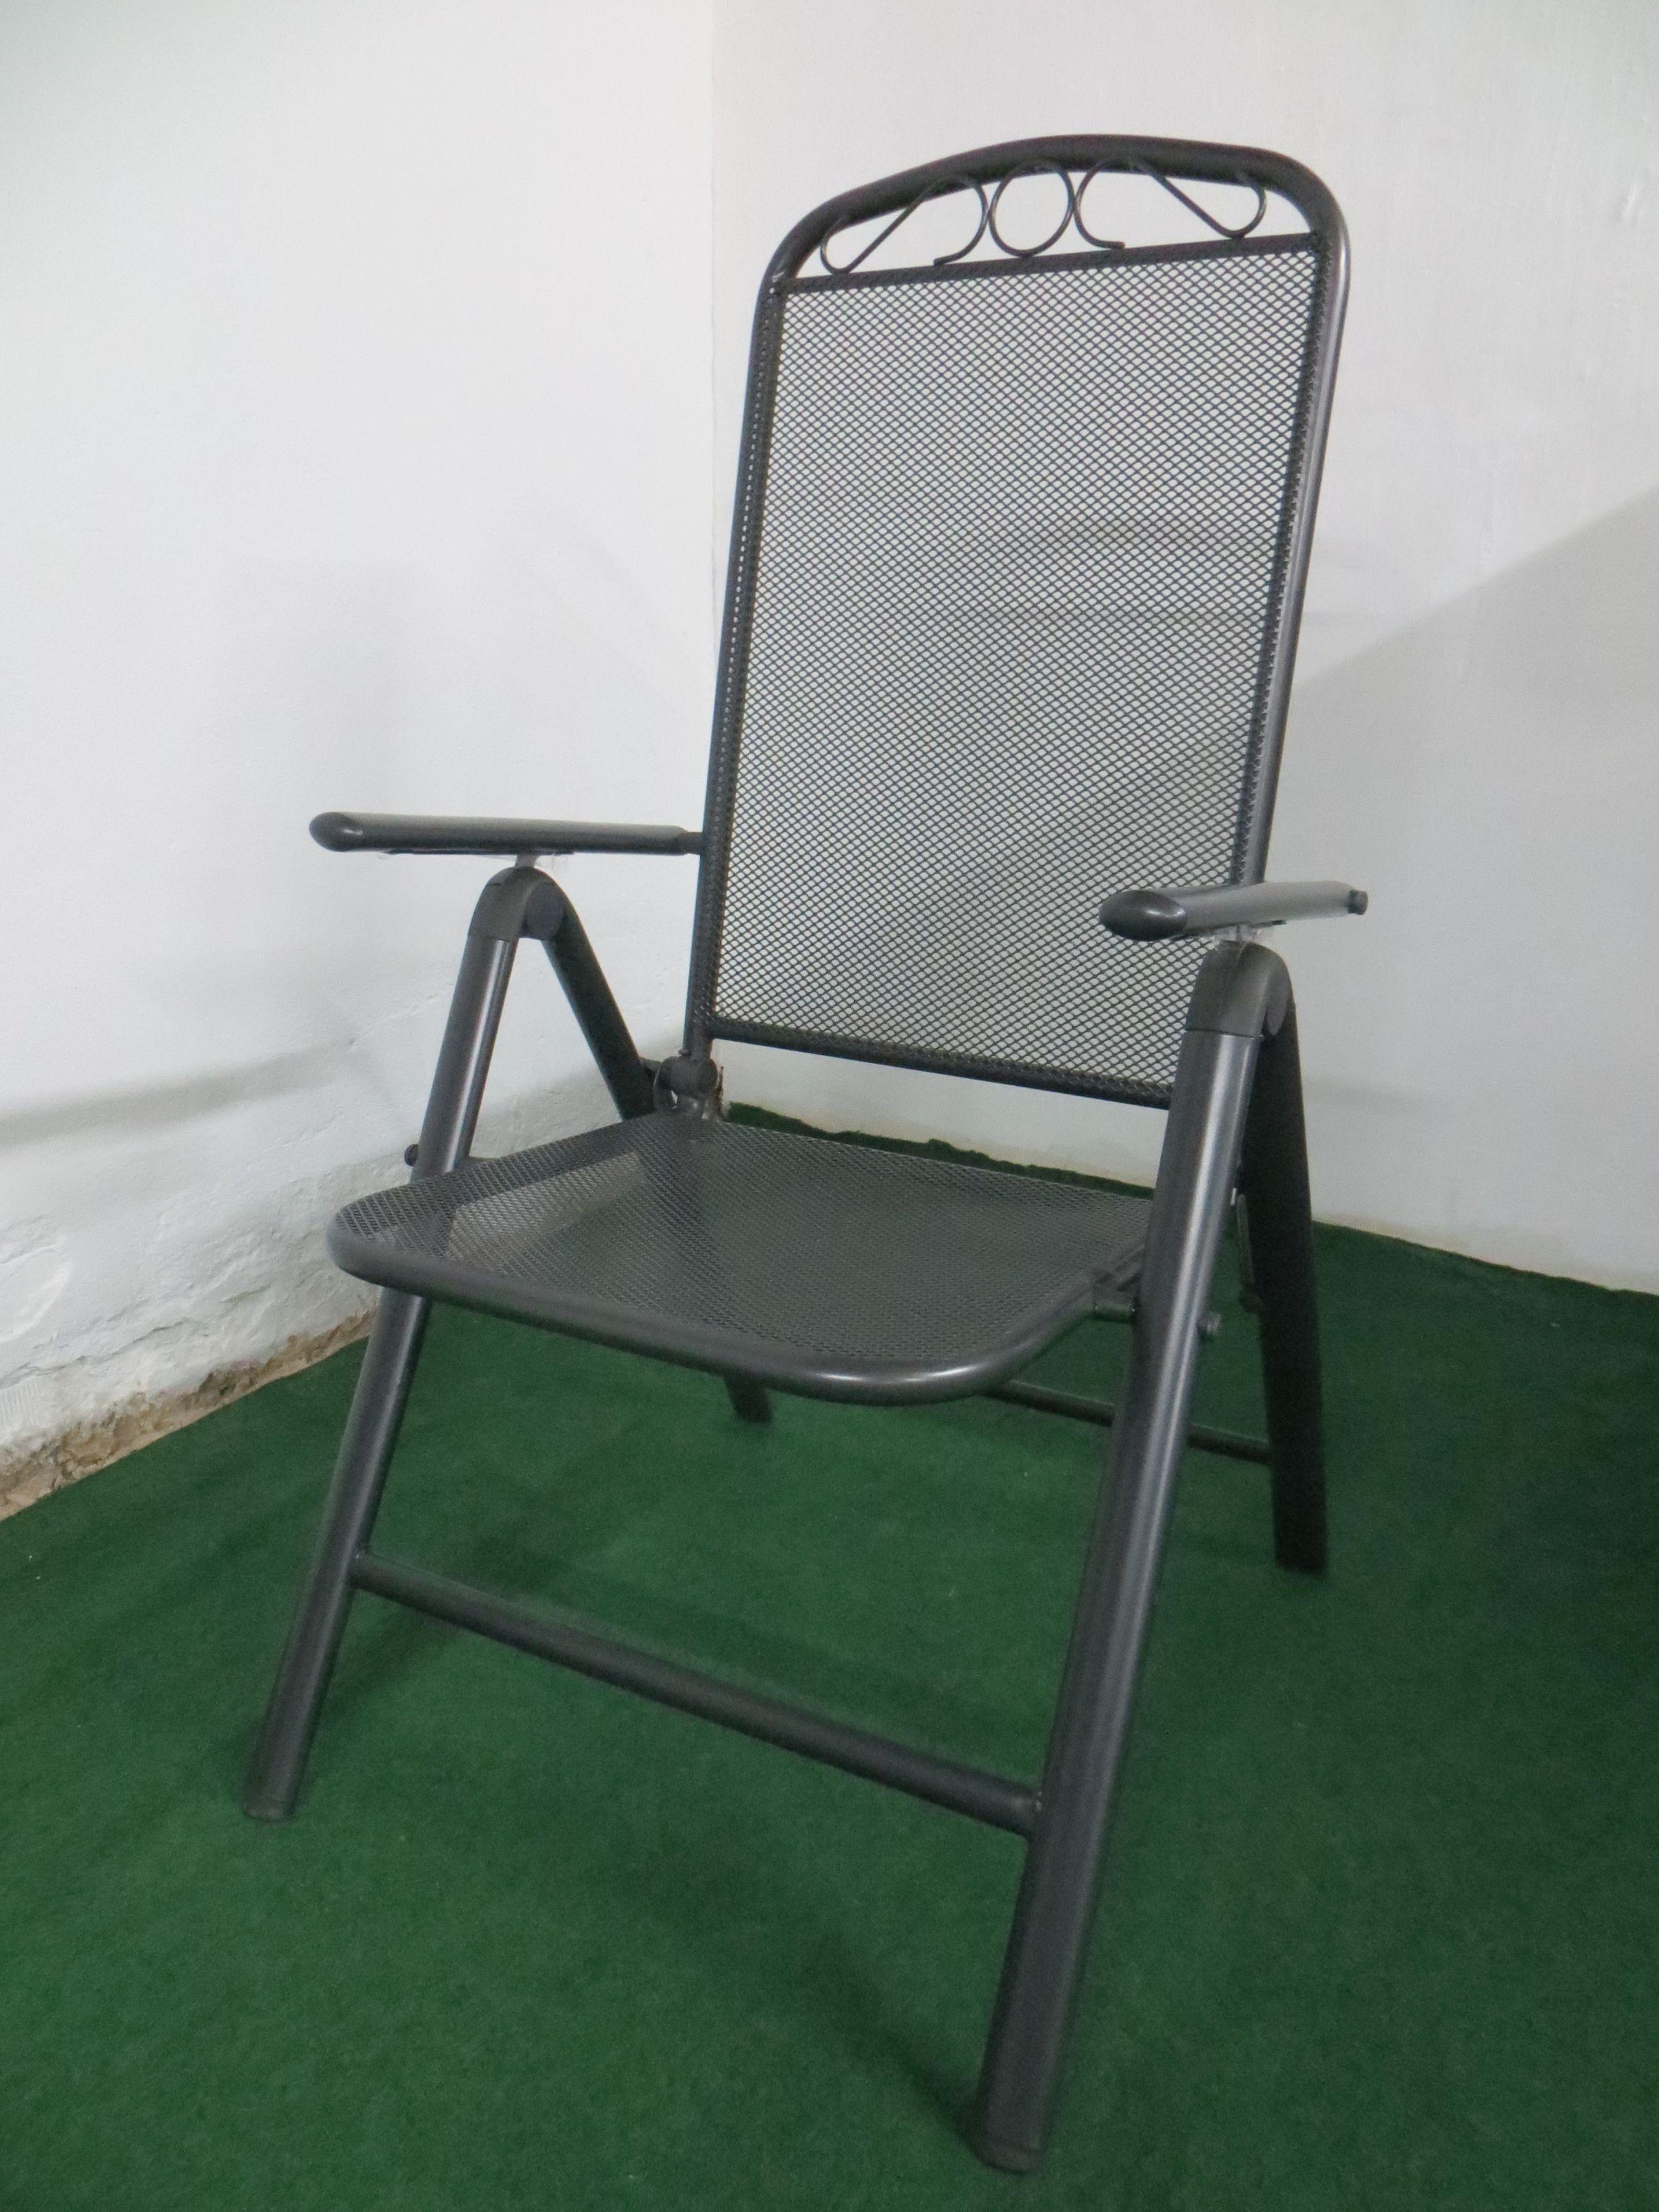 p27 gartenm bel sitzgarnitur 150x90cm 7 teilig grau. Black Bedroom Furniture Sets. Home Design Ideas